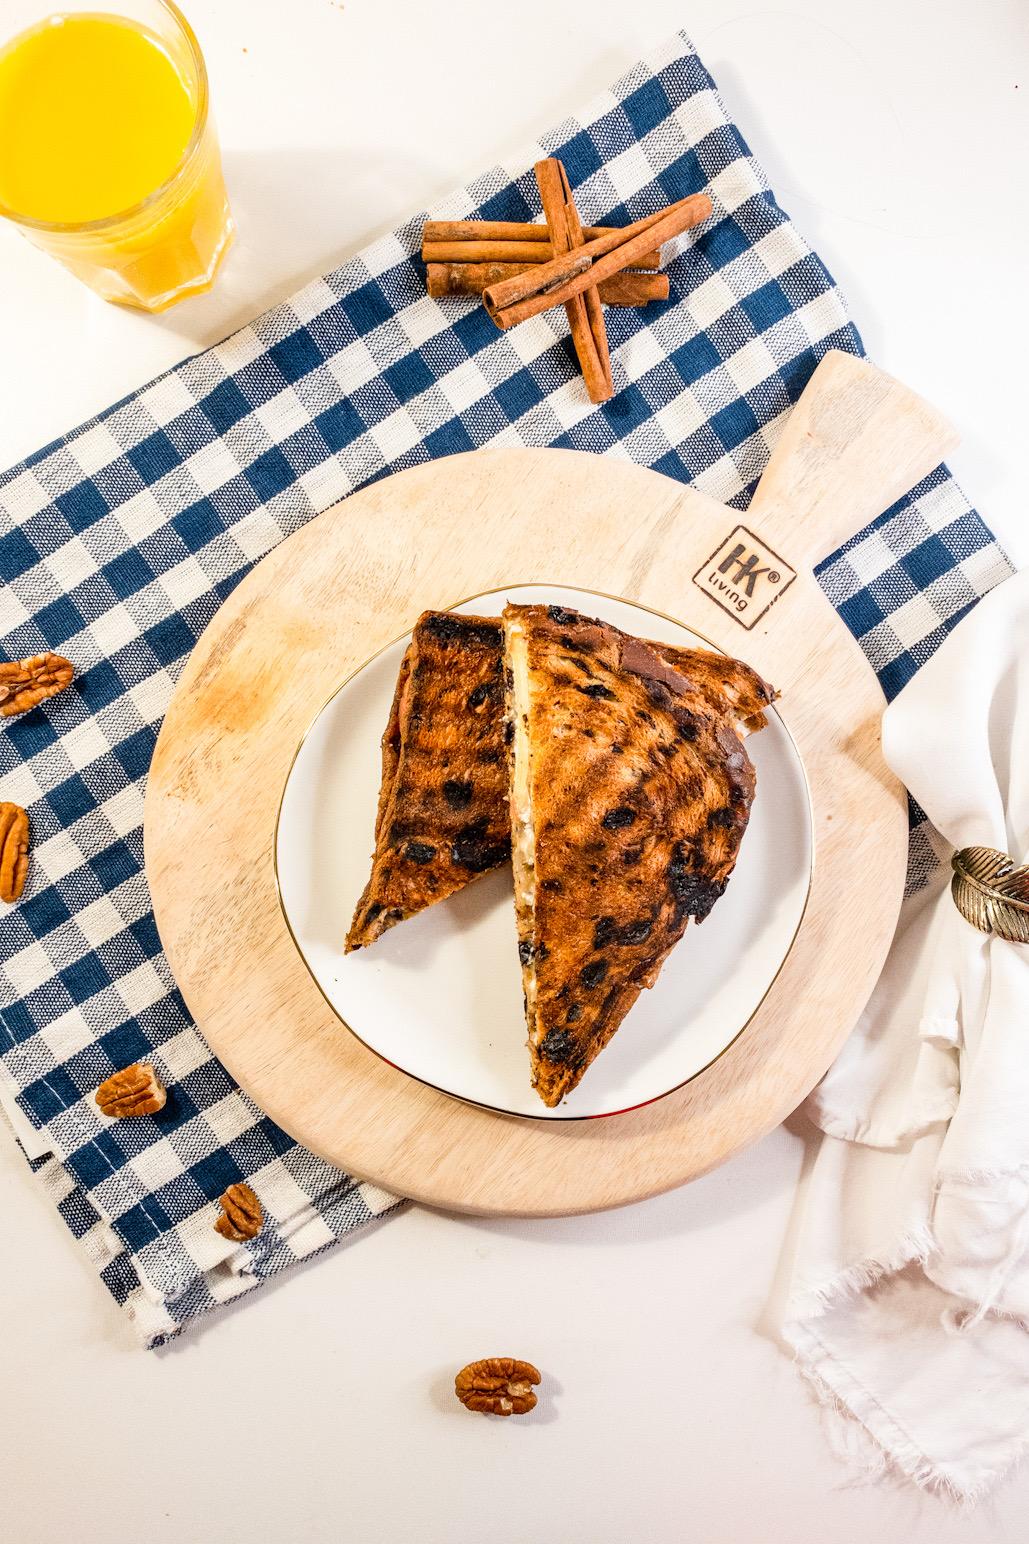 Appelflap tosti